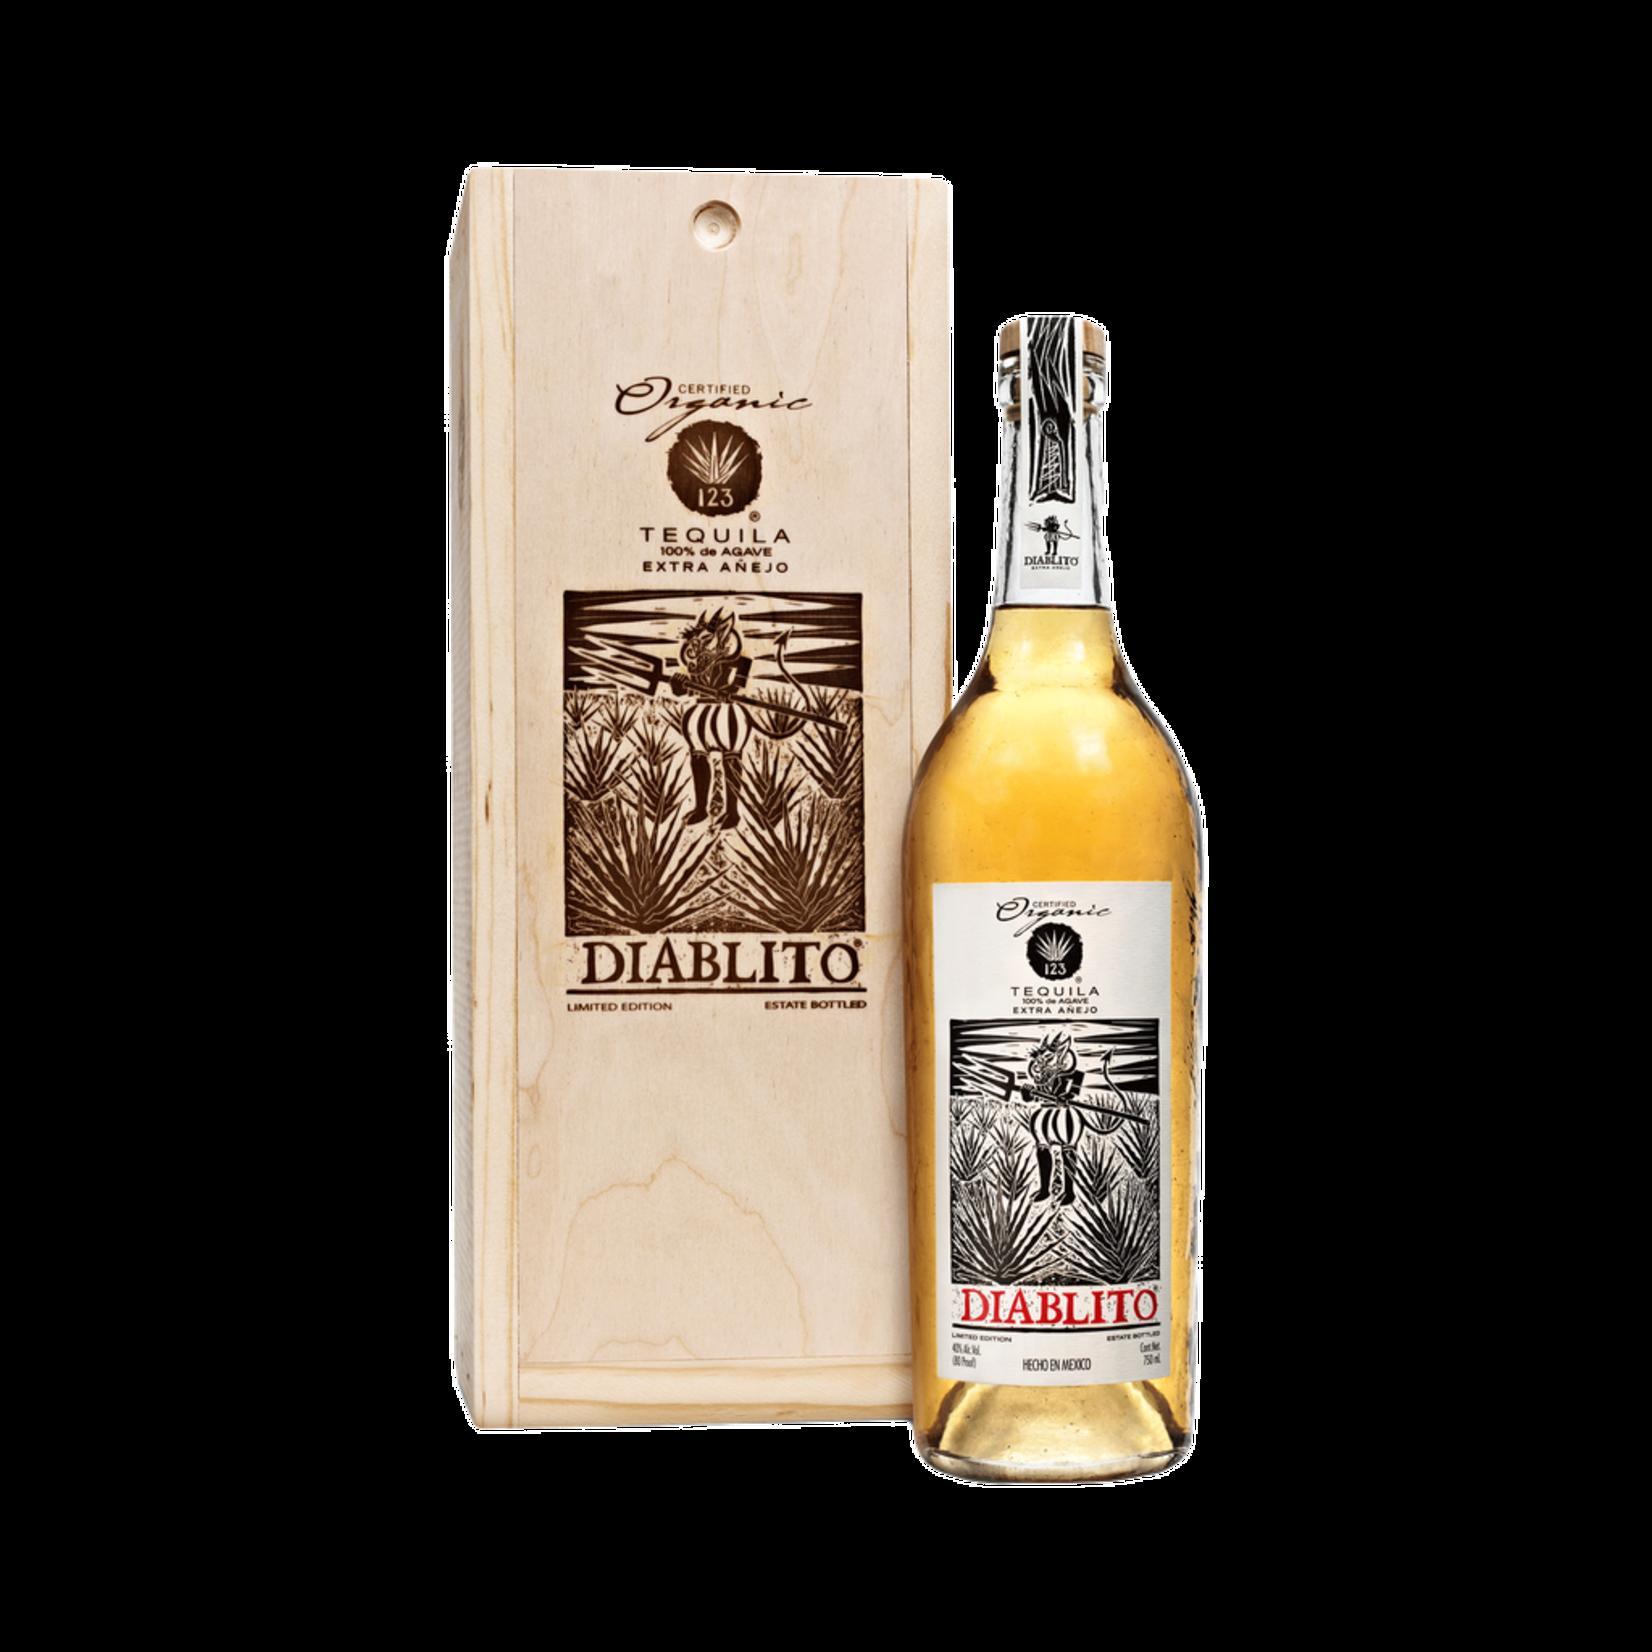 Spirits 123 Organic Tequila Extra Anejo Diablito owc